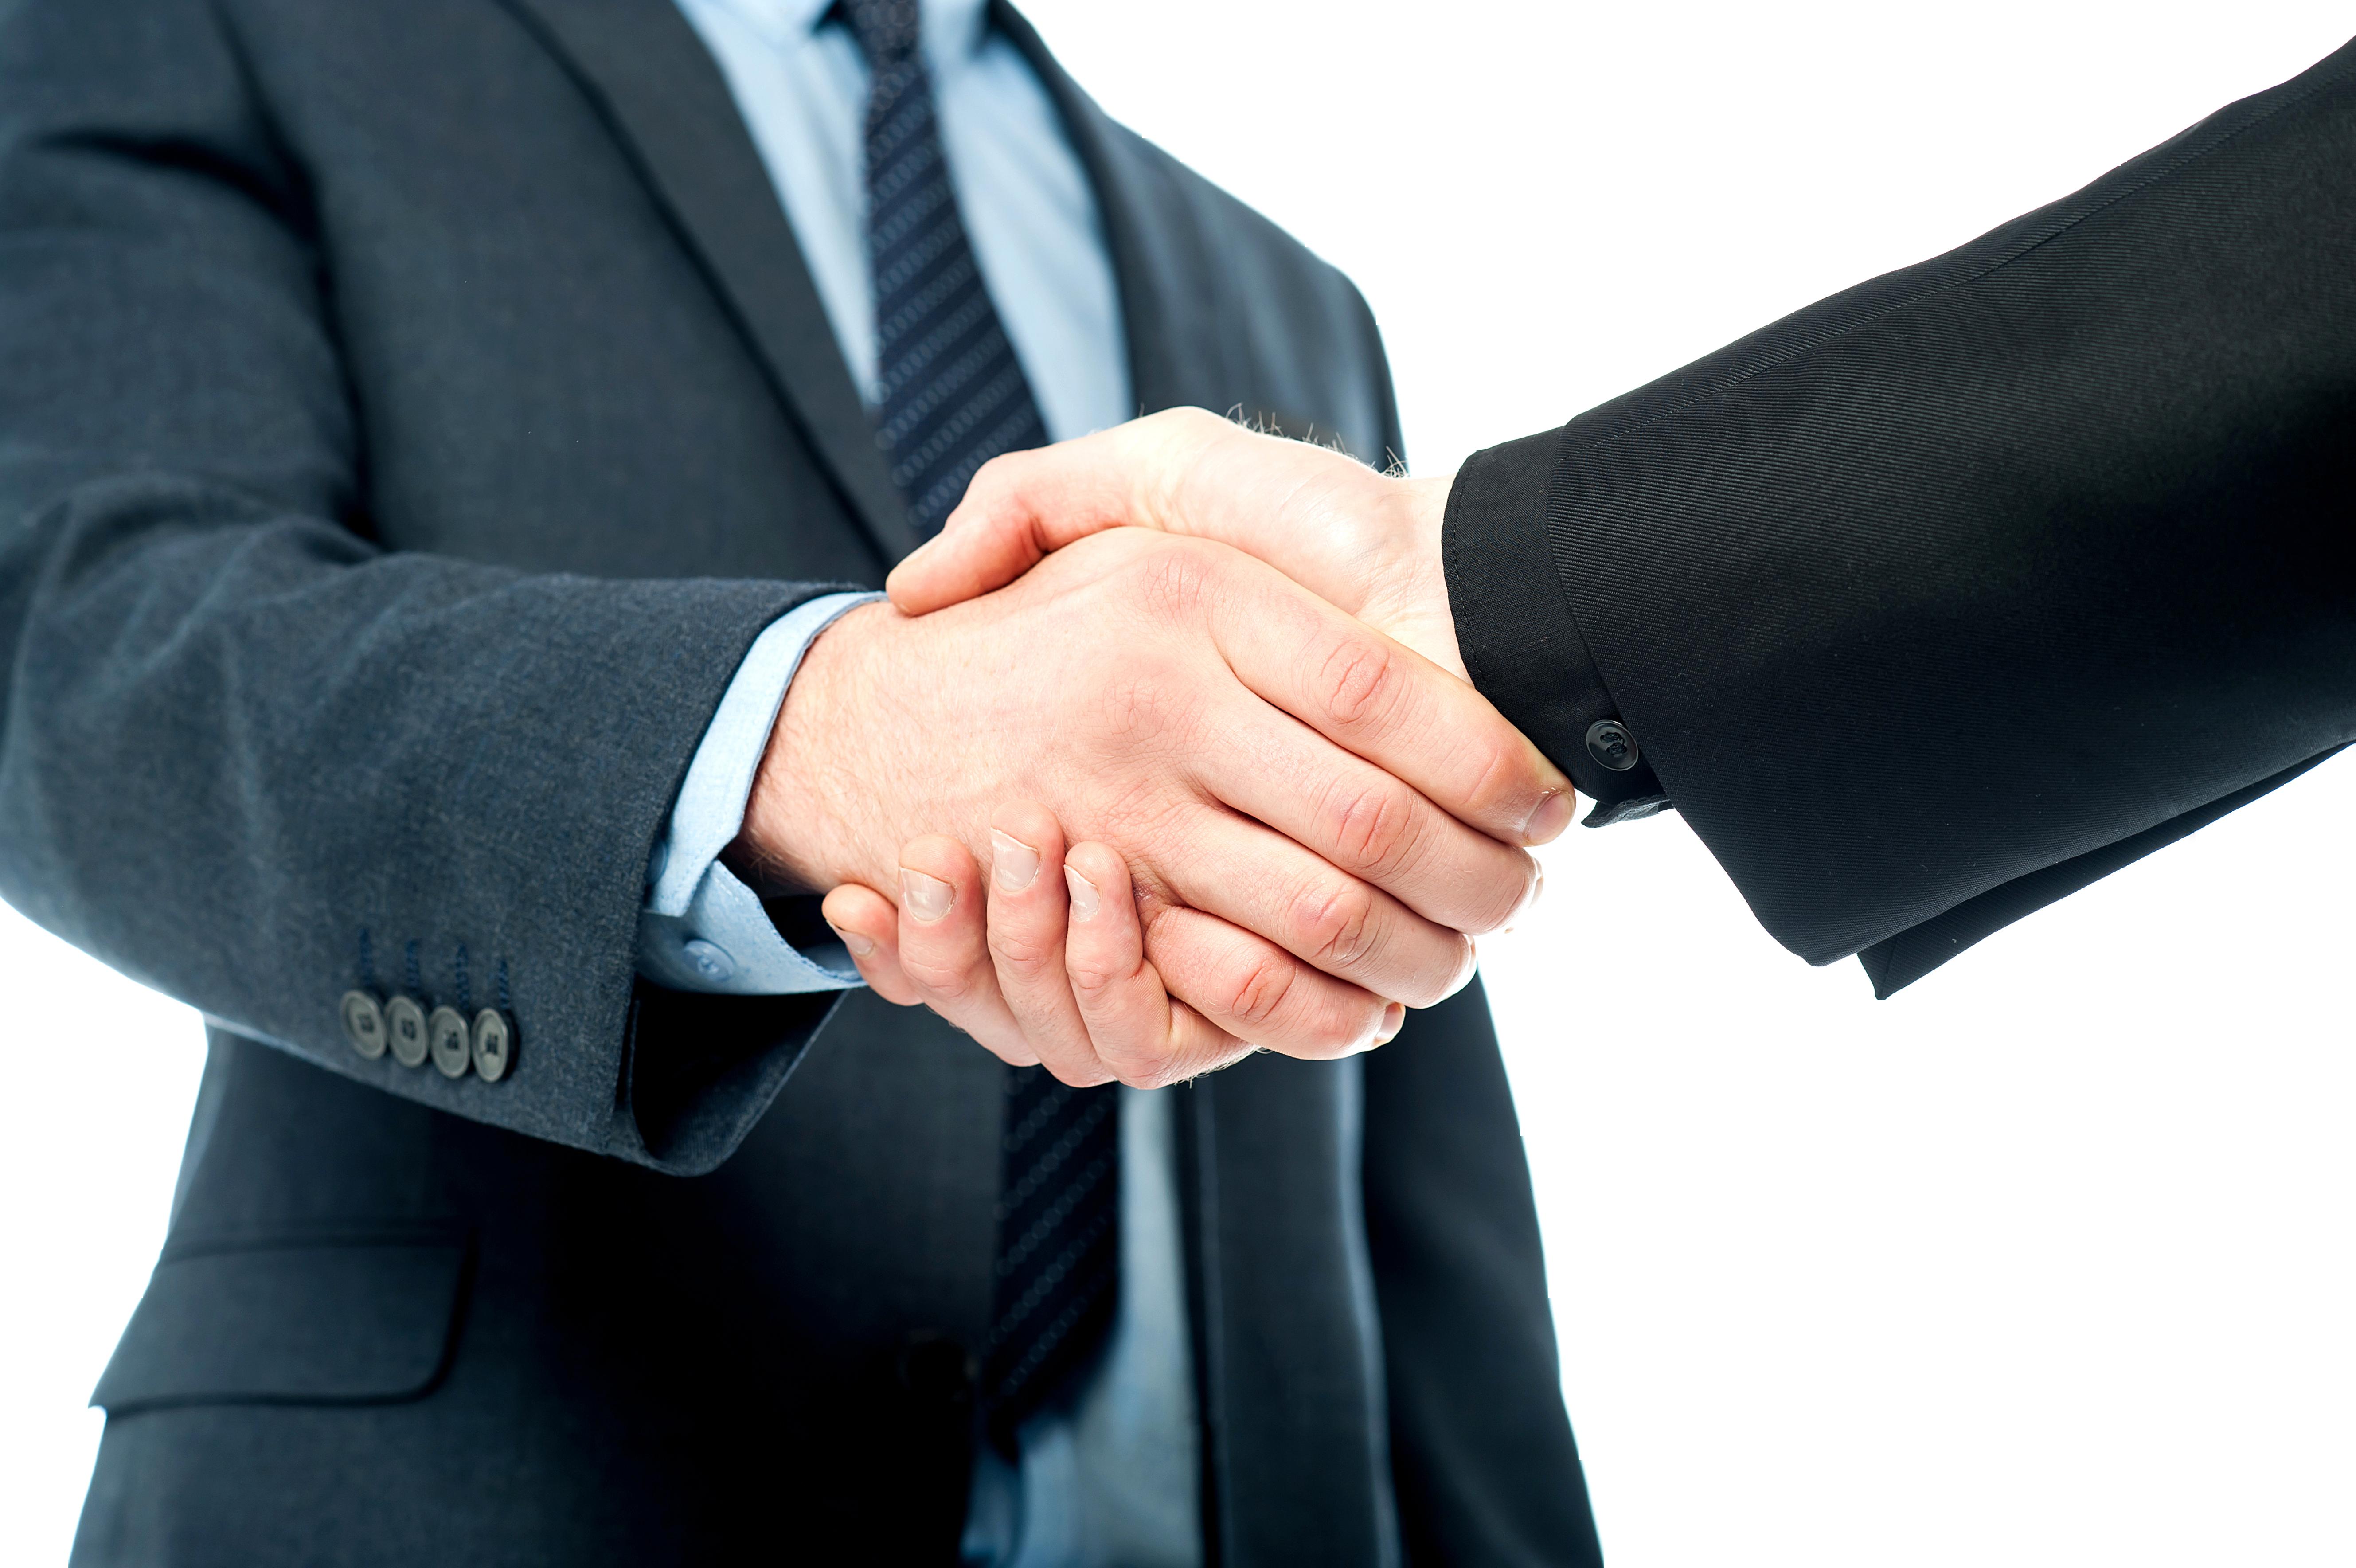 Business Handshake Free PNG Image - Handshake PNG HD